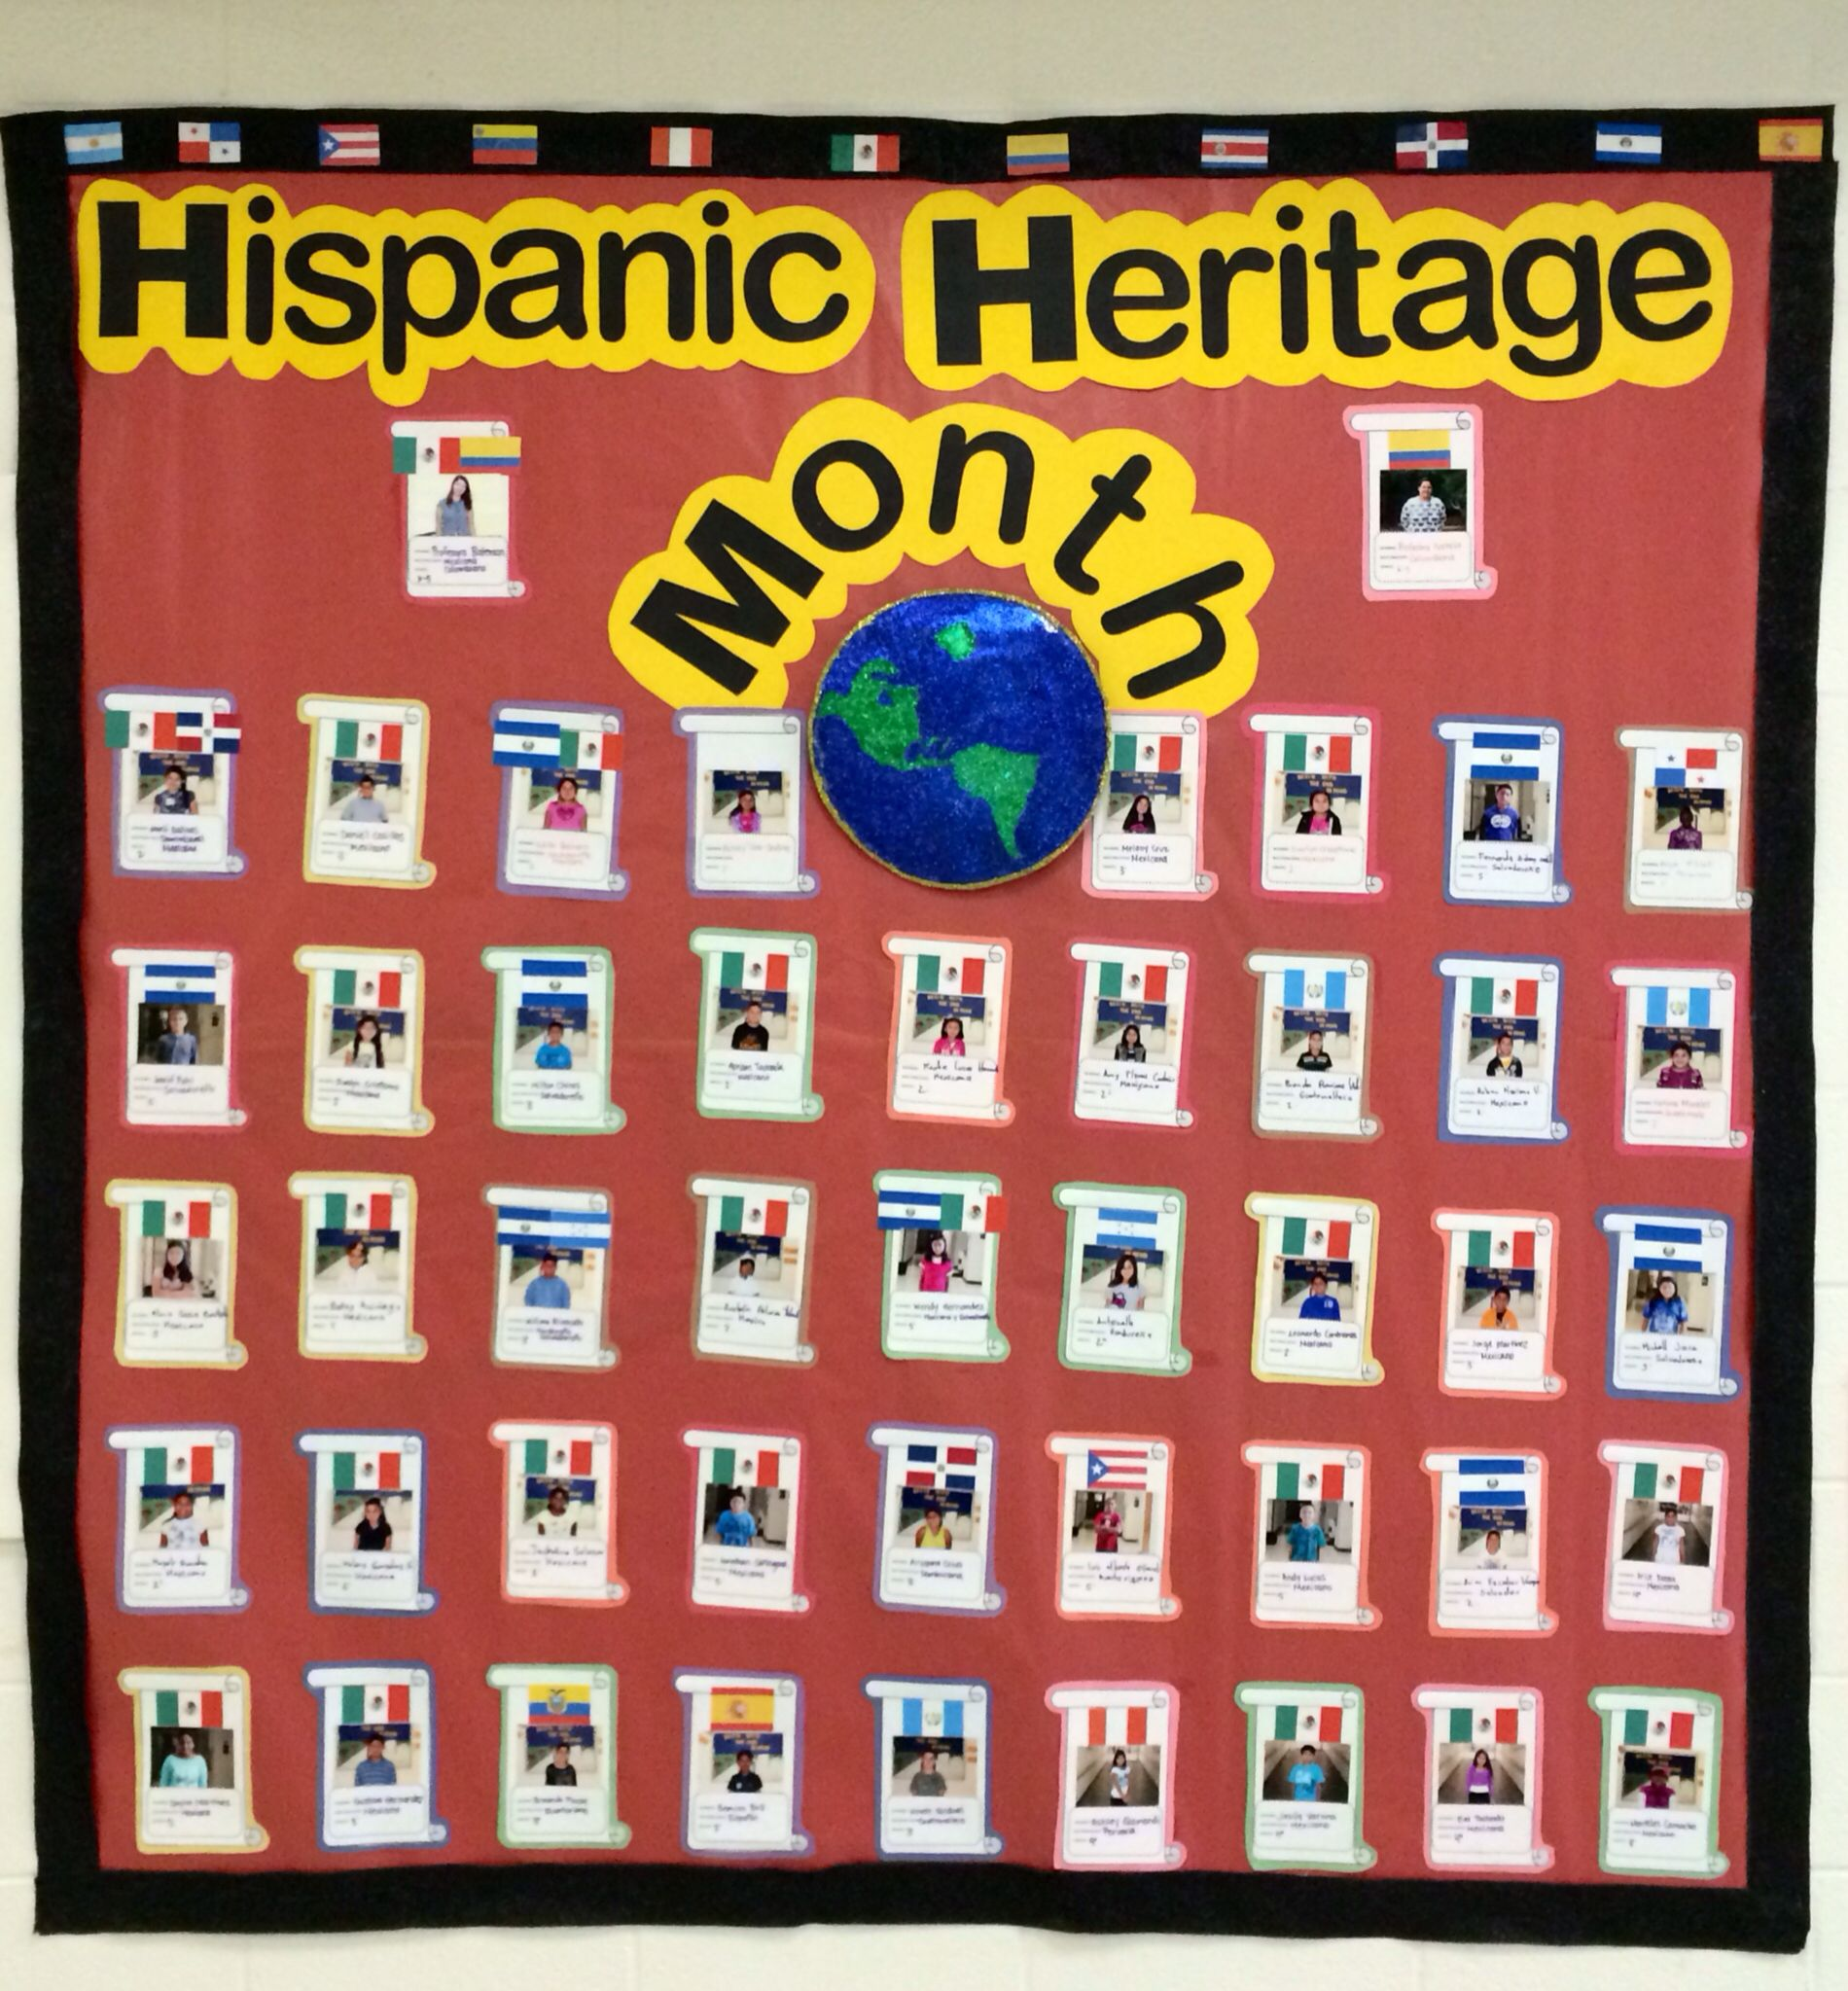 Hispanic Heritage Month Display Of Students With Hispanic